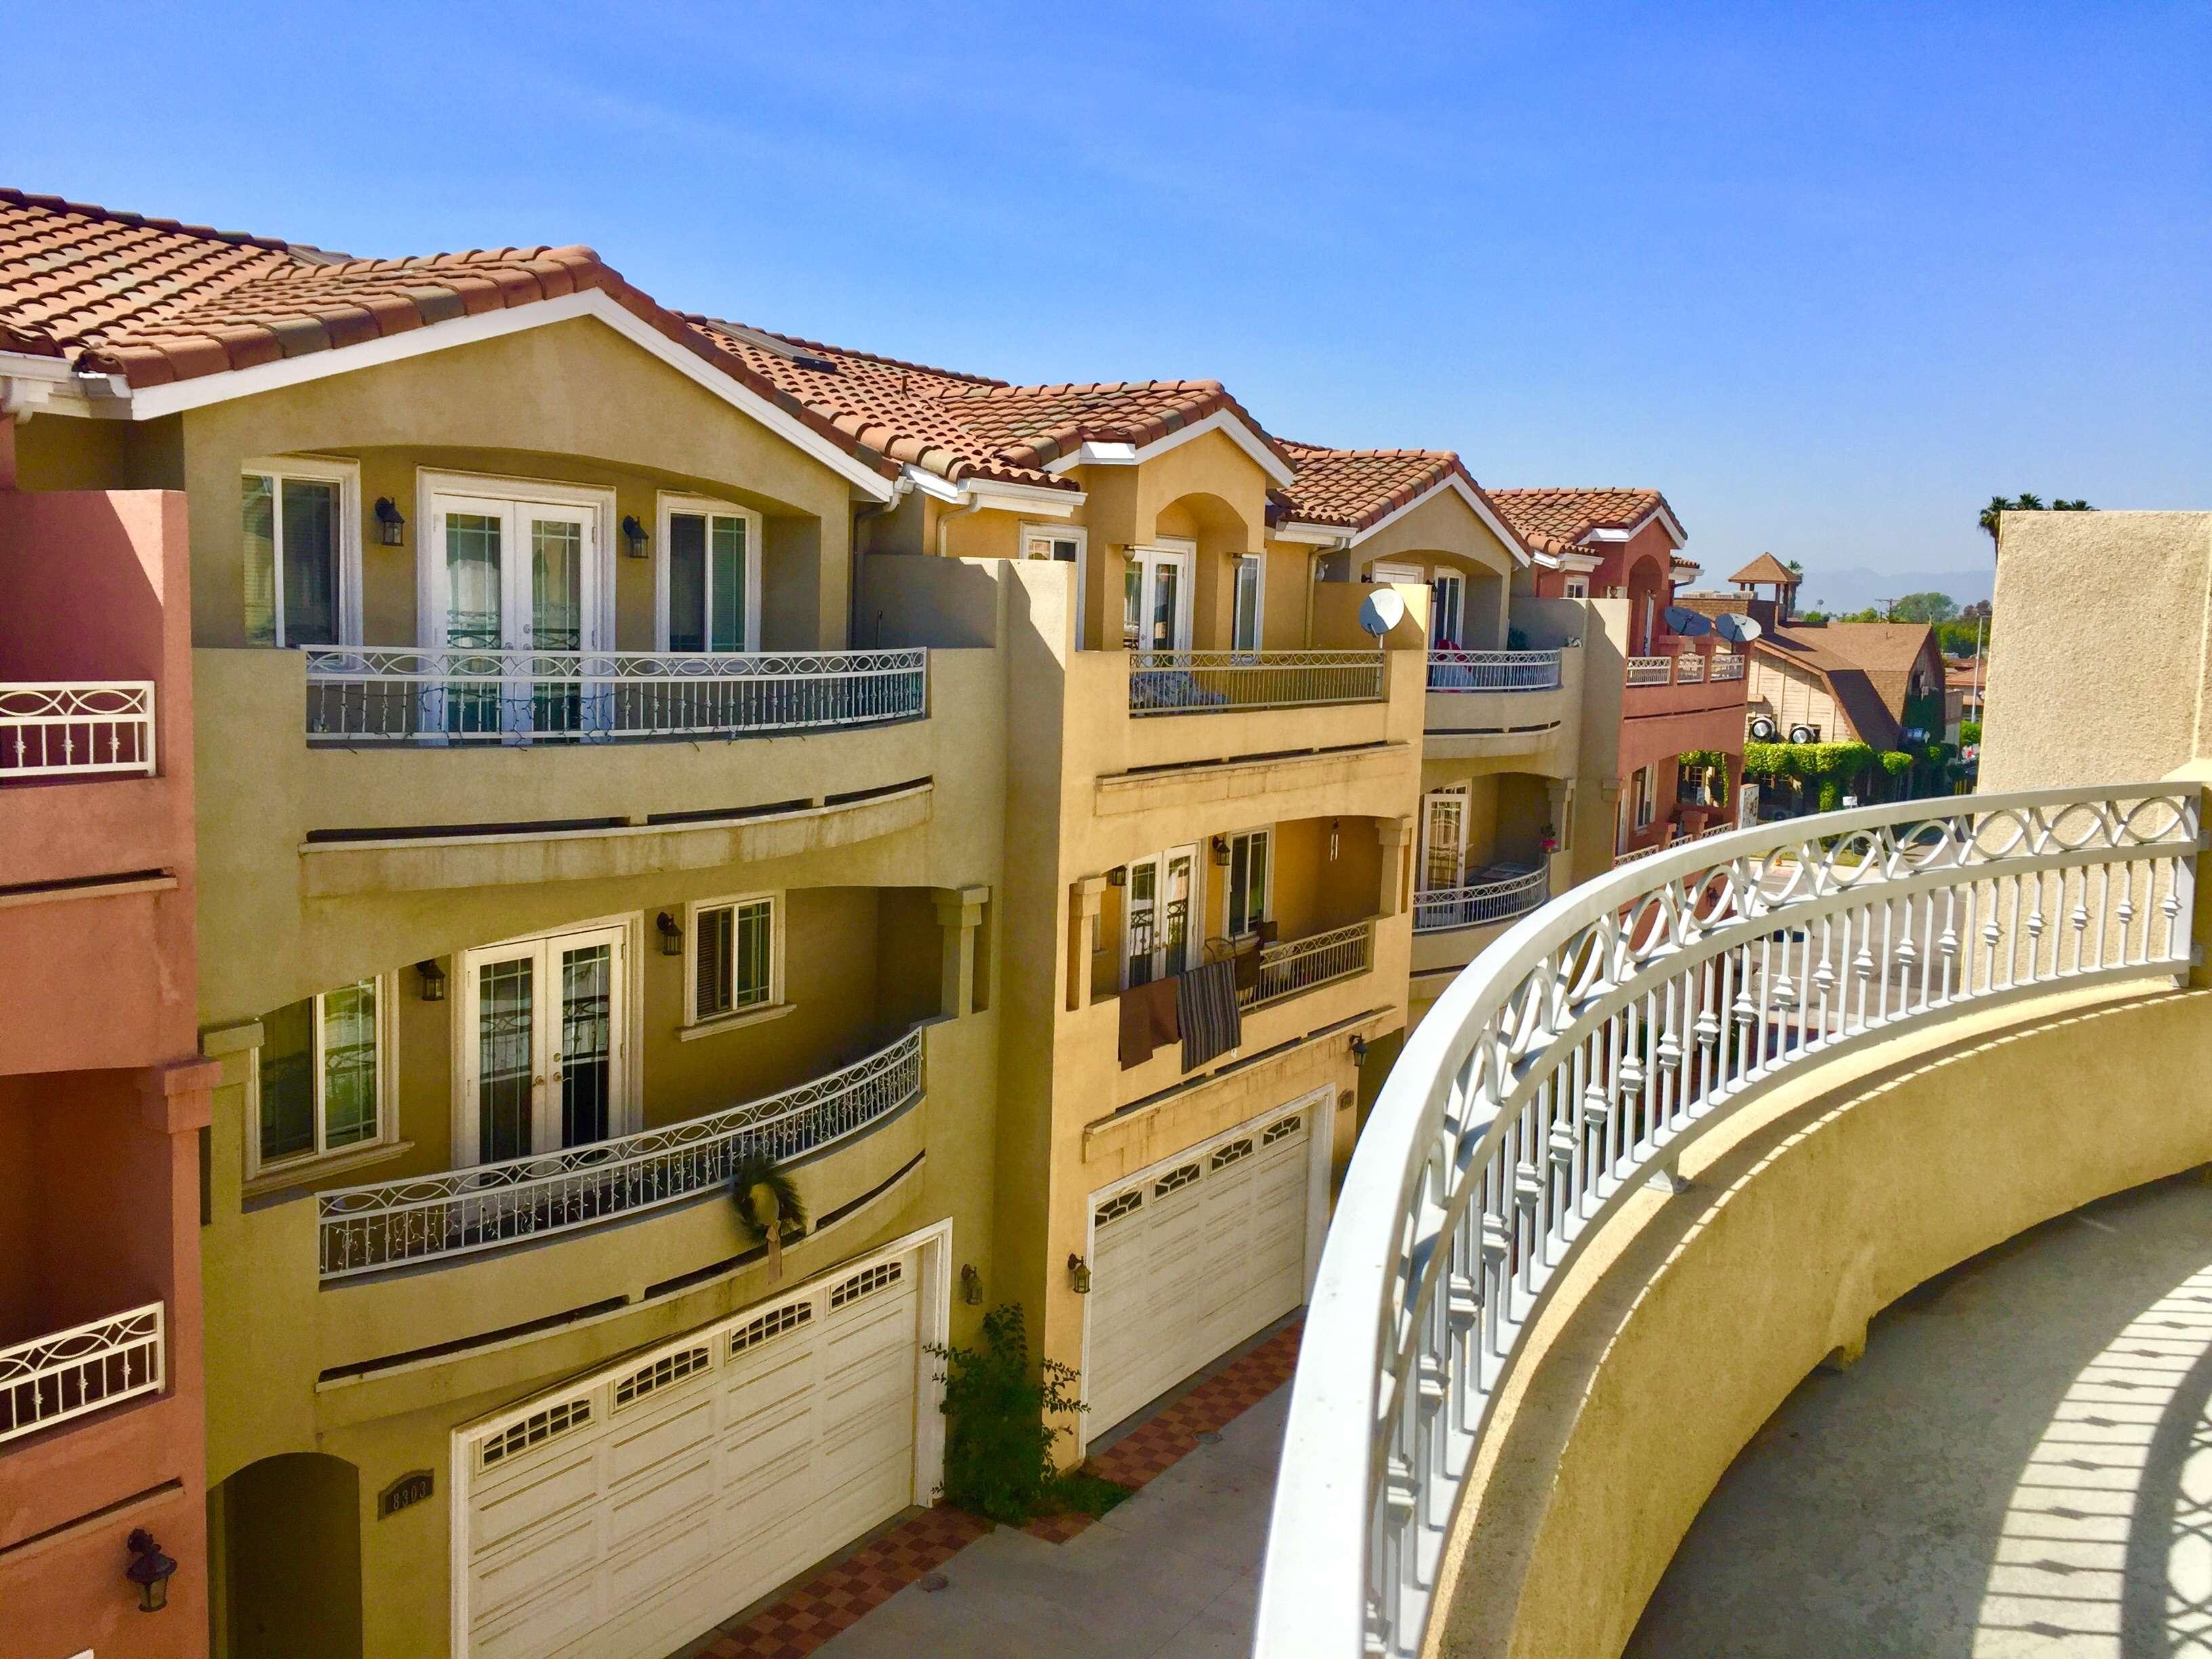 8300 Golden Cir, Garden Grove, CA 92844 ⋆ National Brokers